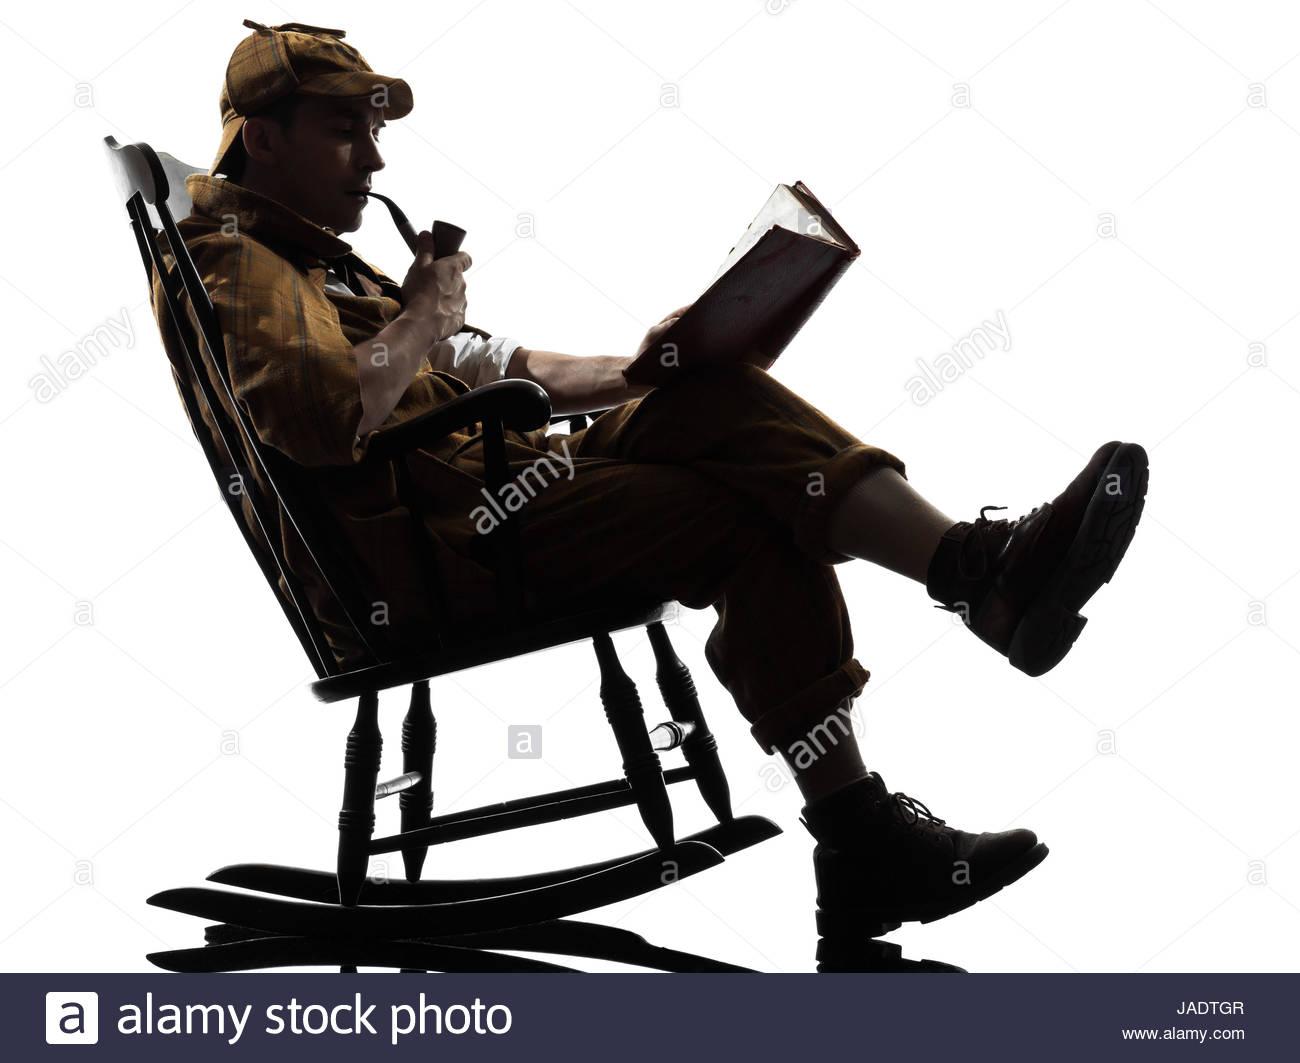 1300x1063 Sherlock Holmes Reading Silhouette Sitting Rocking Chair